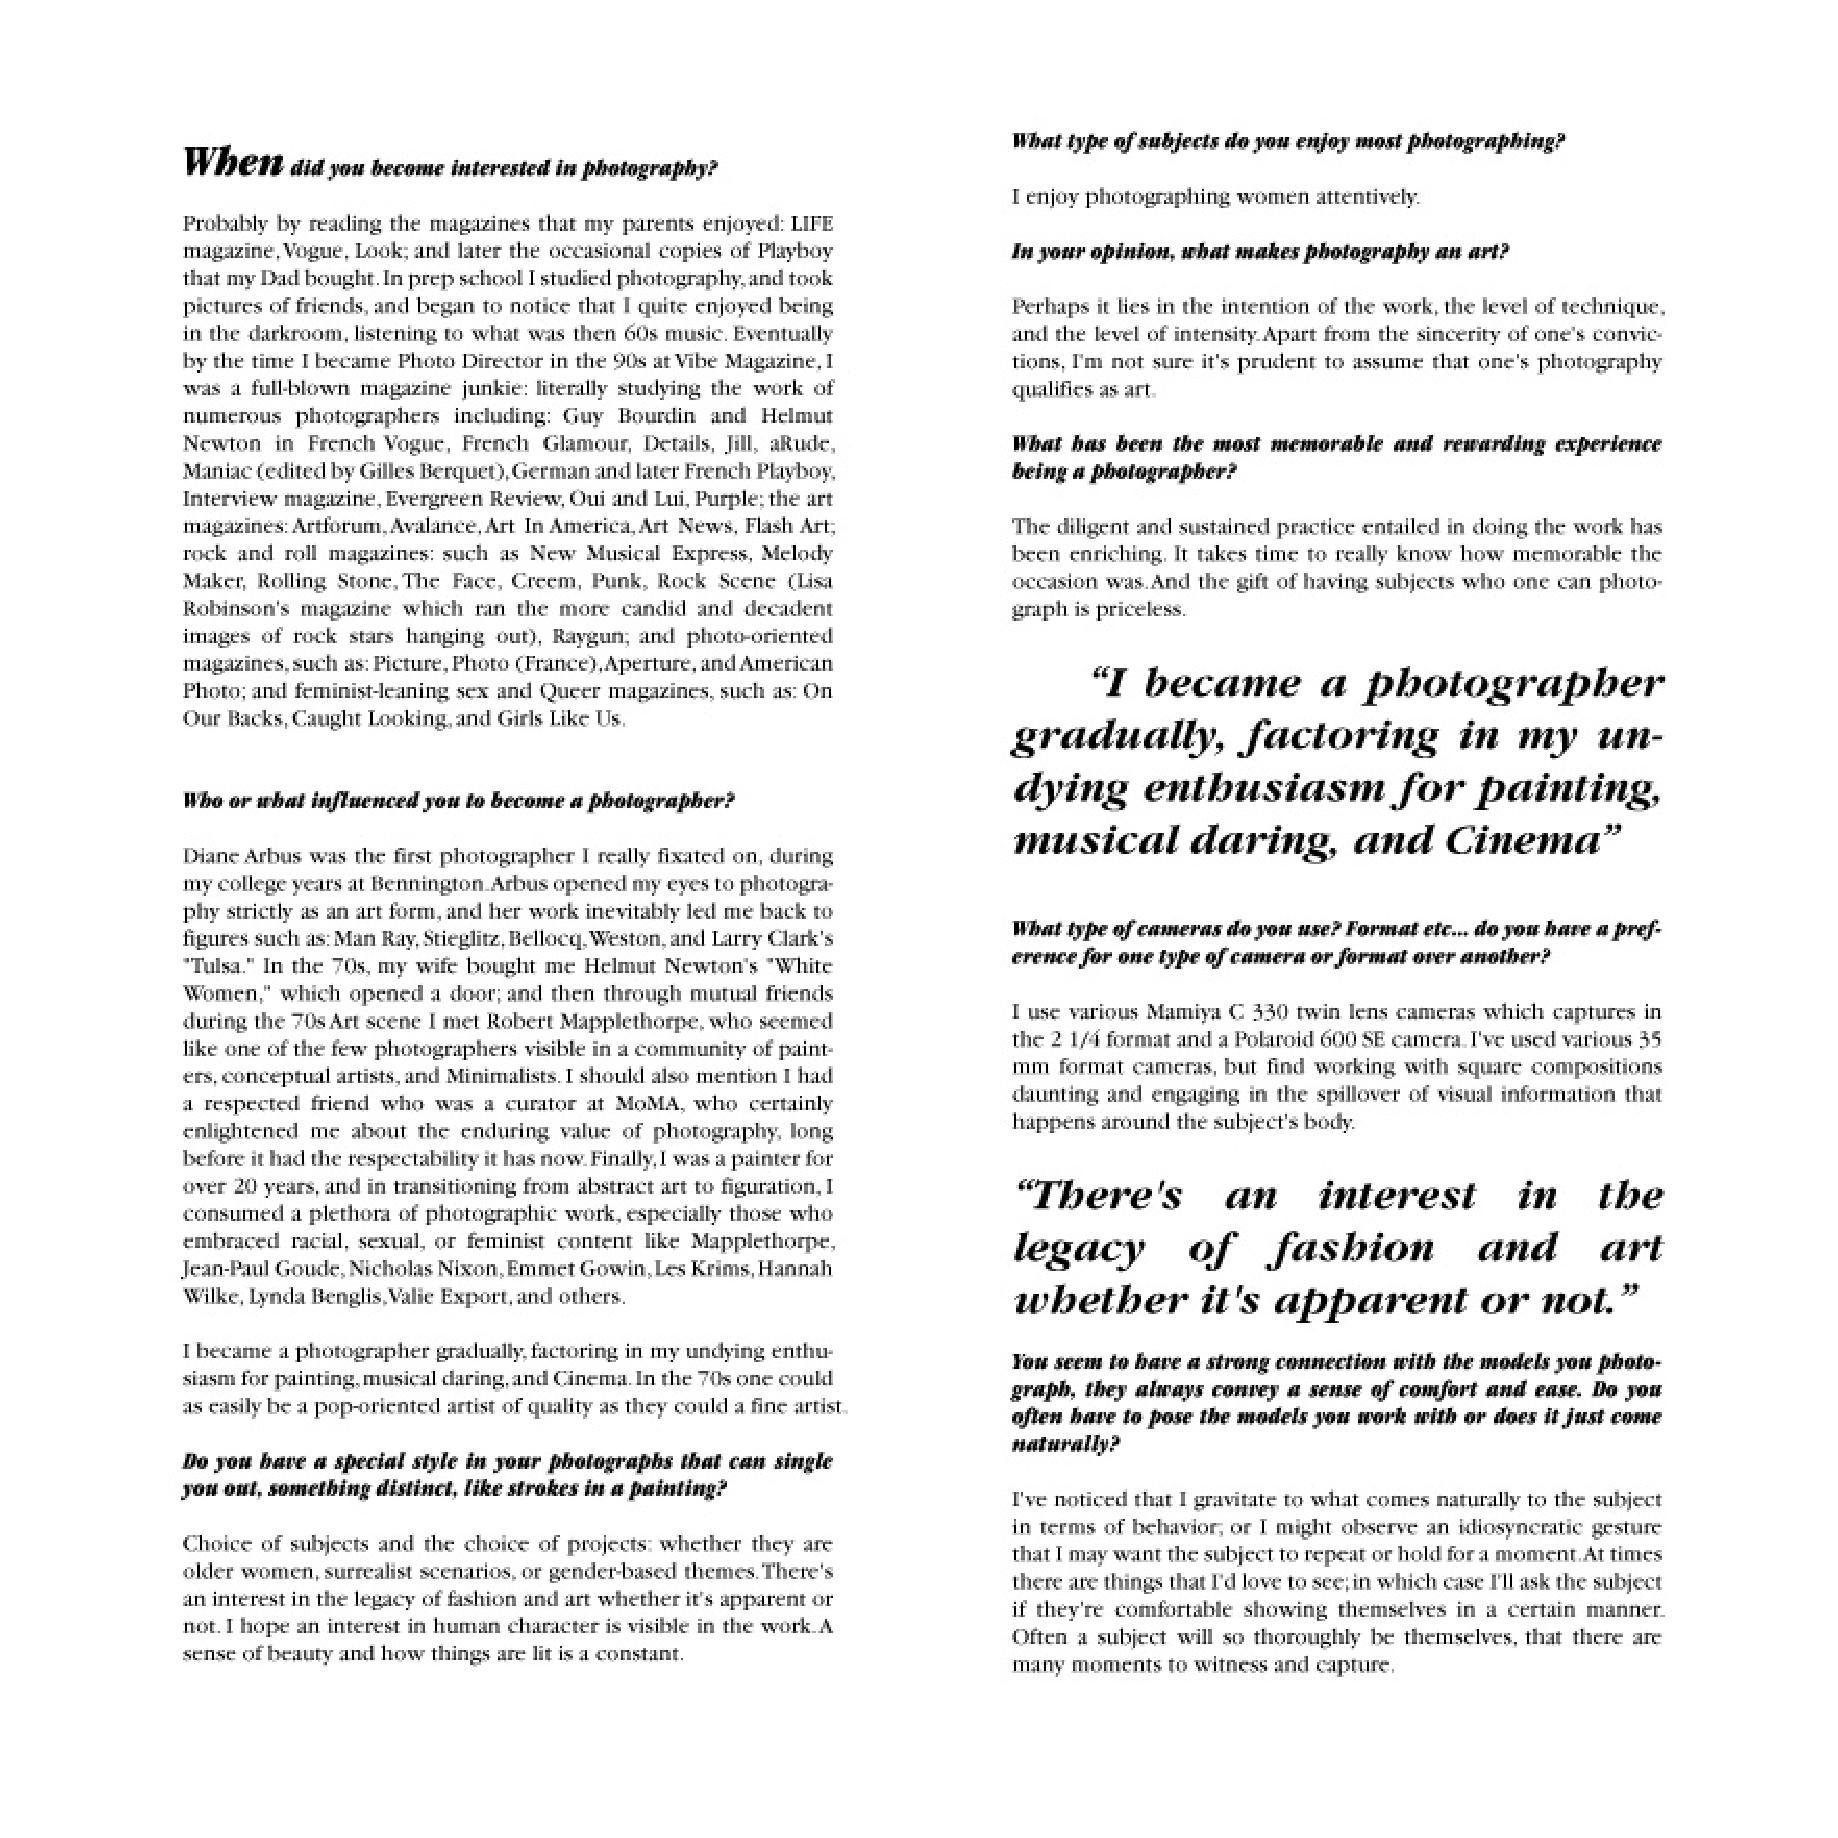 SUPP*3_PDF1_000083